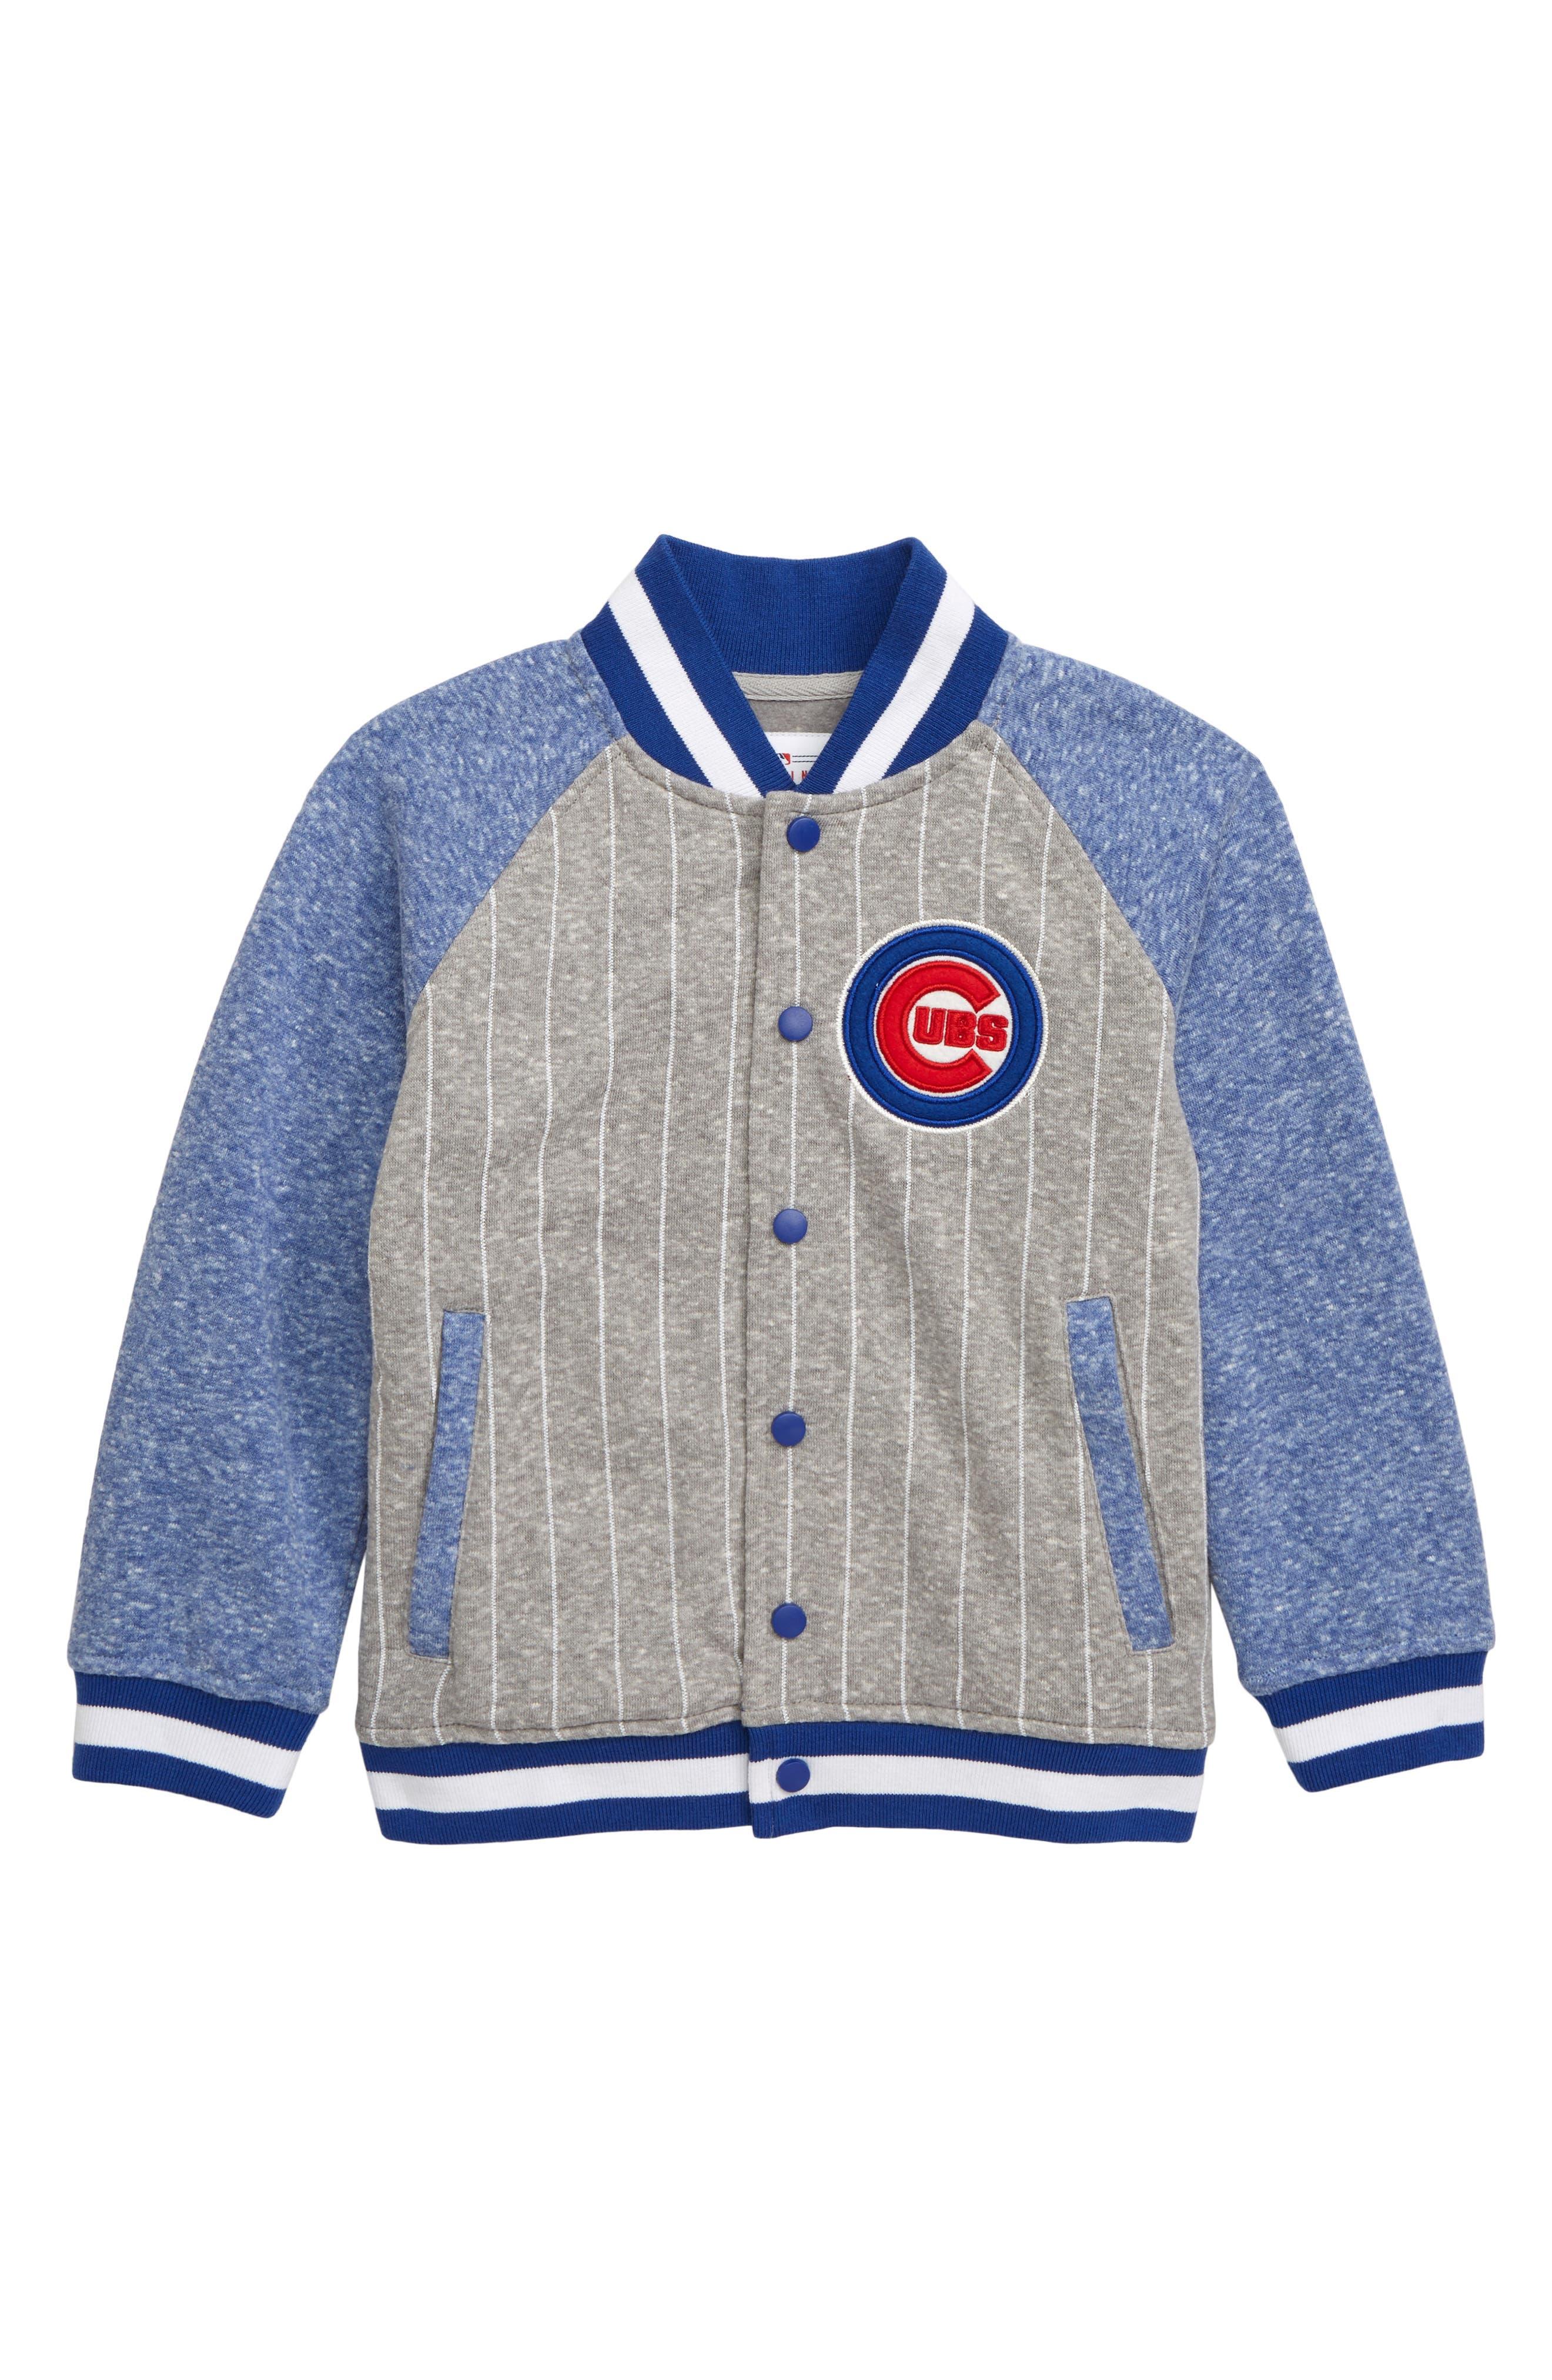 MAJESTIC MLB Chicago Cubs Pride Fleece Bomber Jacket, Main, color, ROYAL BLUE